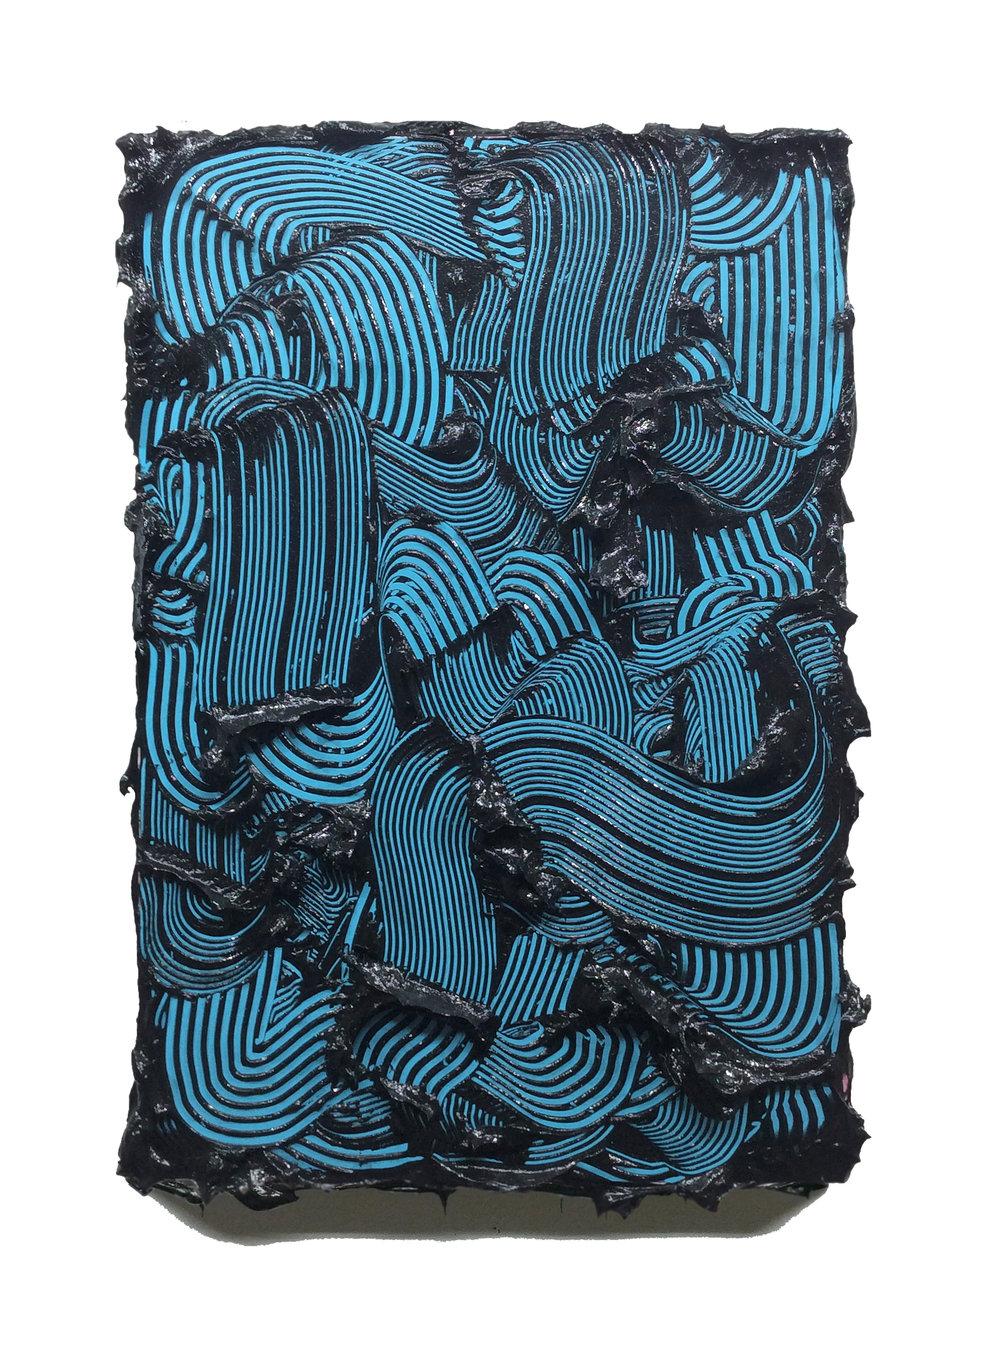 Poseidon  - 2018 - Acrylic, Gel & Vinyl on Panel - 18x12in / 46x30cm